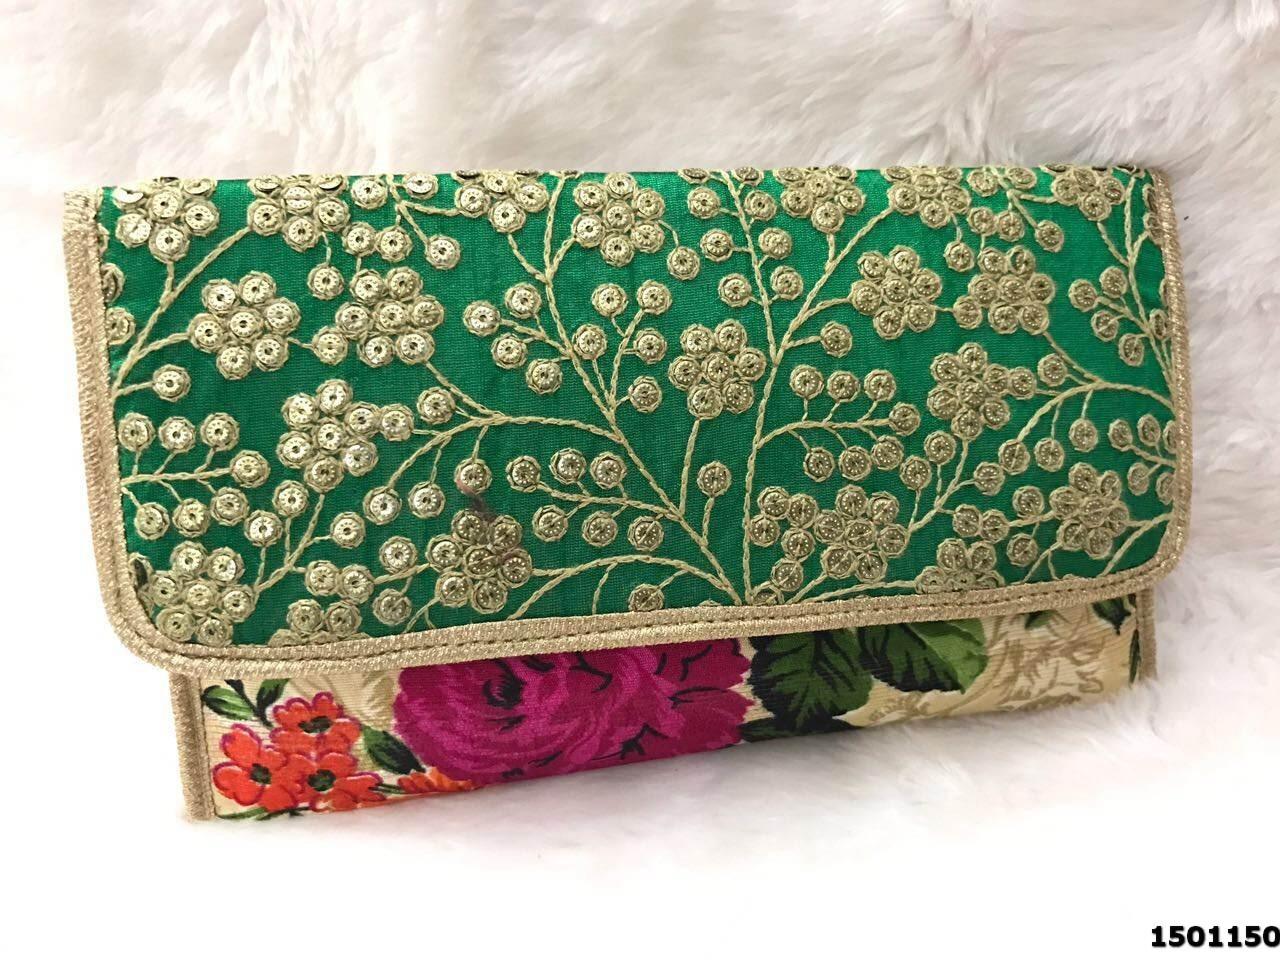 Sensational Beautiful Clutch Bag